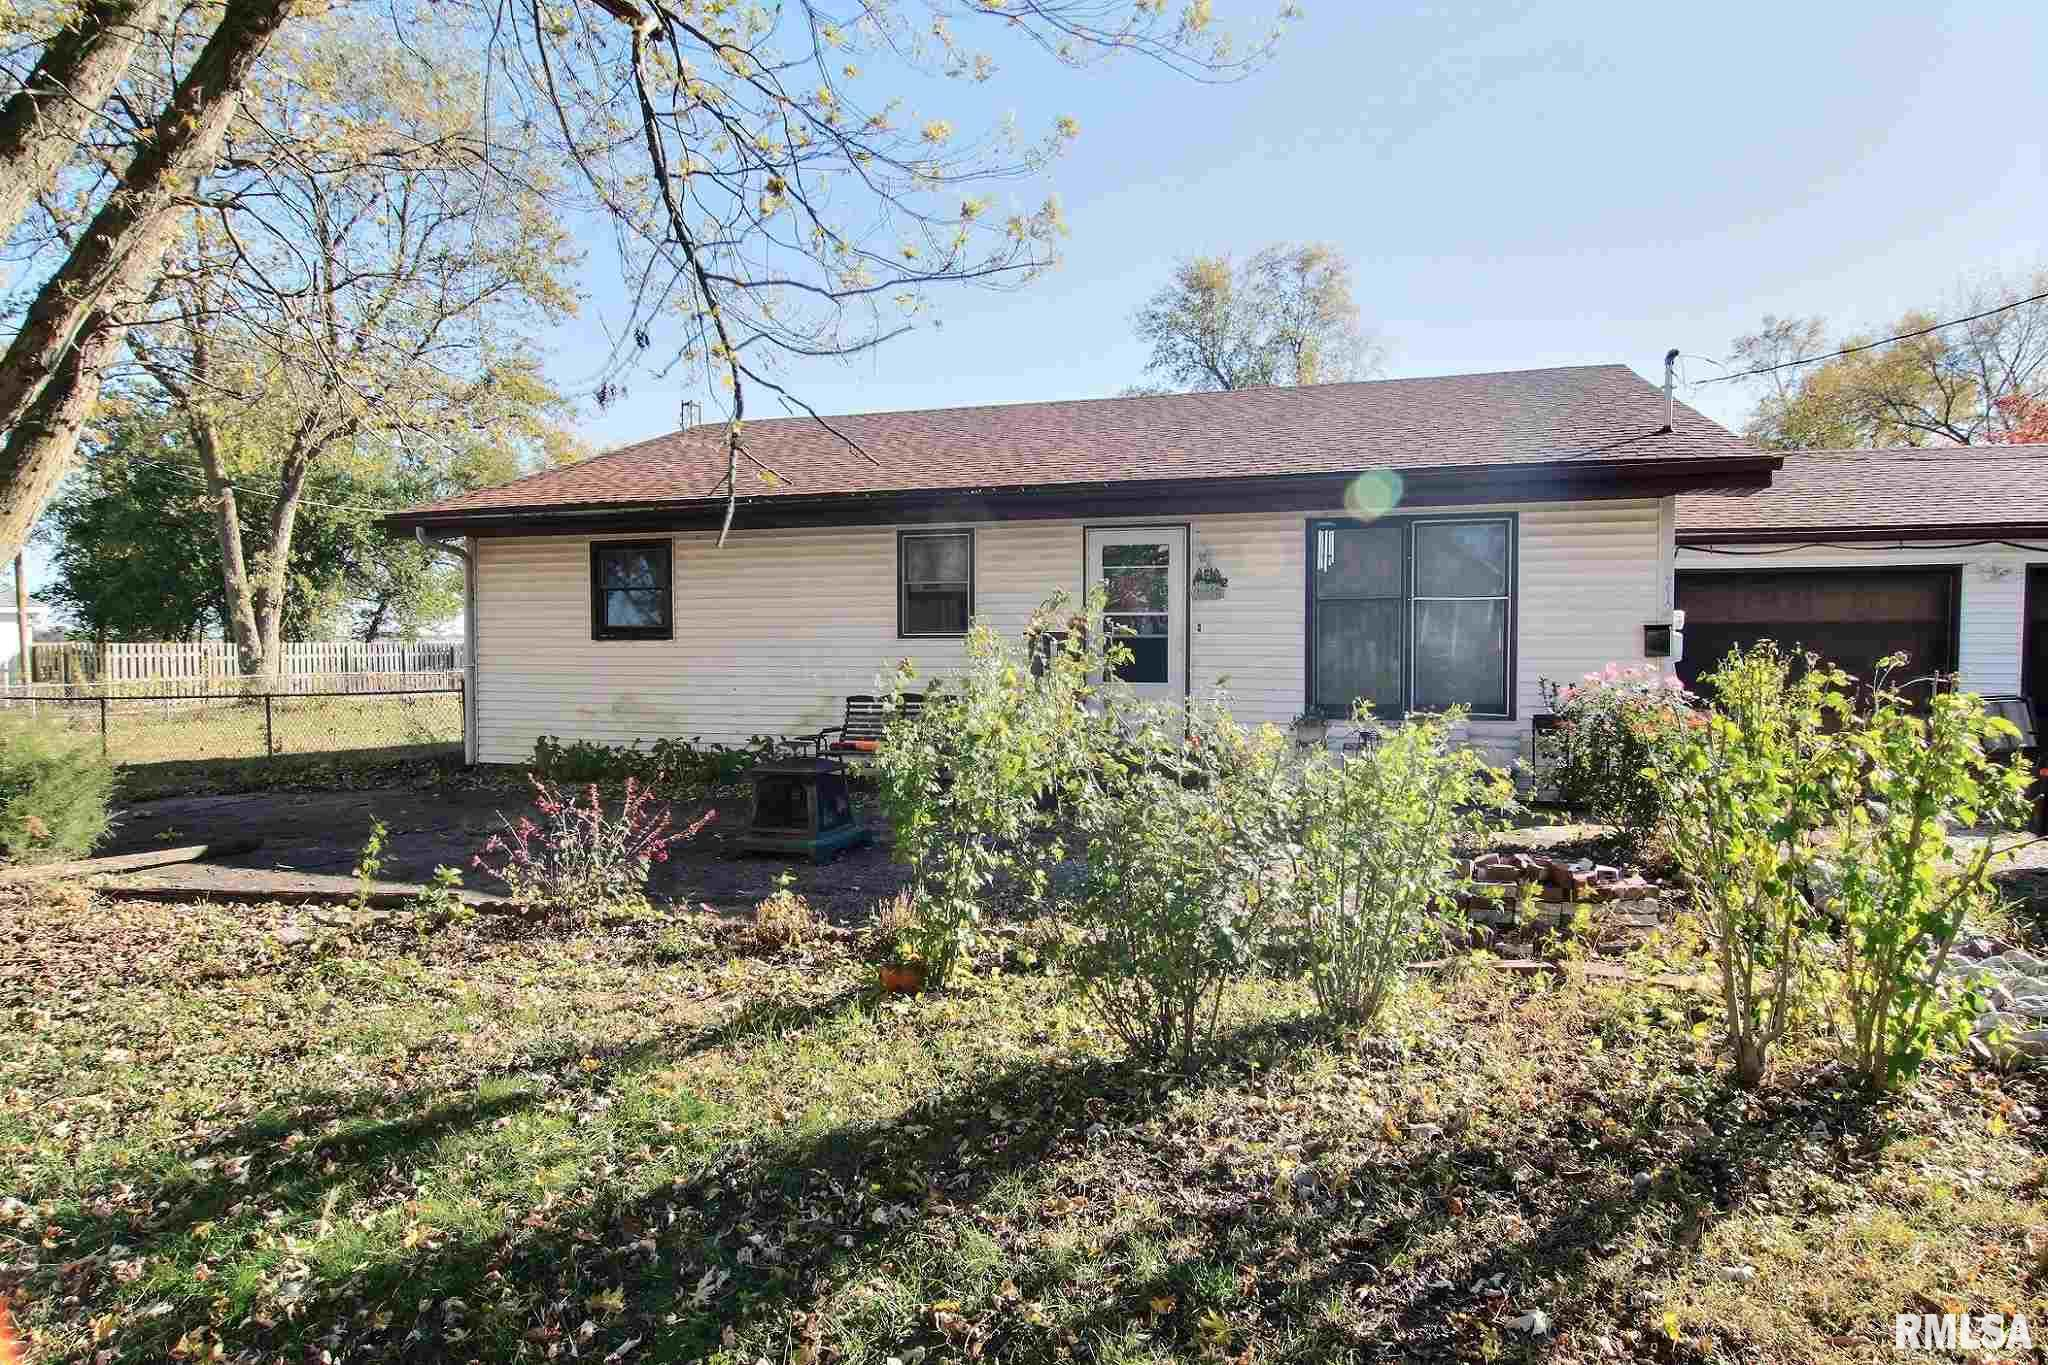 712 E JACKSON Property Photo - Virden, IL real estate listing